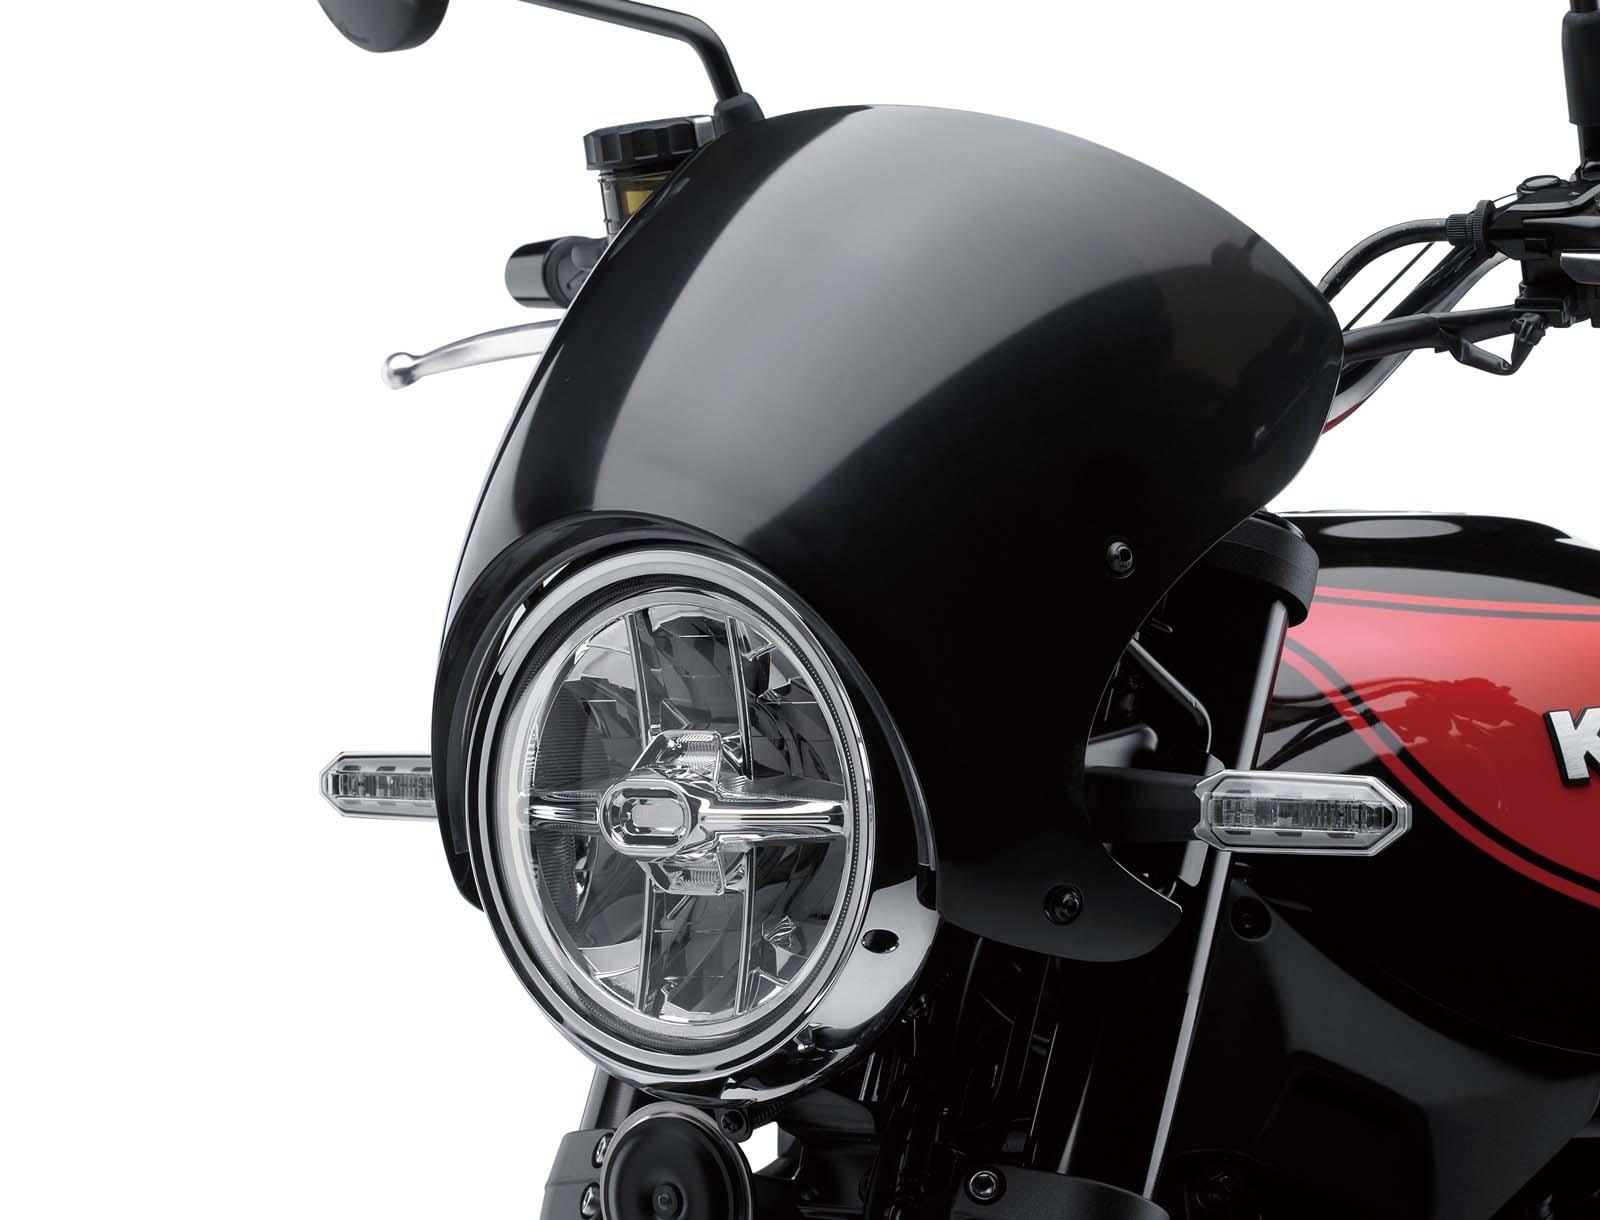 Retro Styled Kawasaki Z900rs Debuts In Tokyo Asphalt